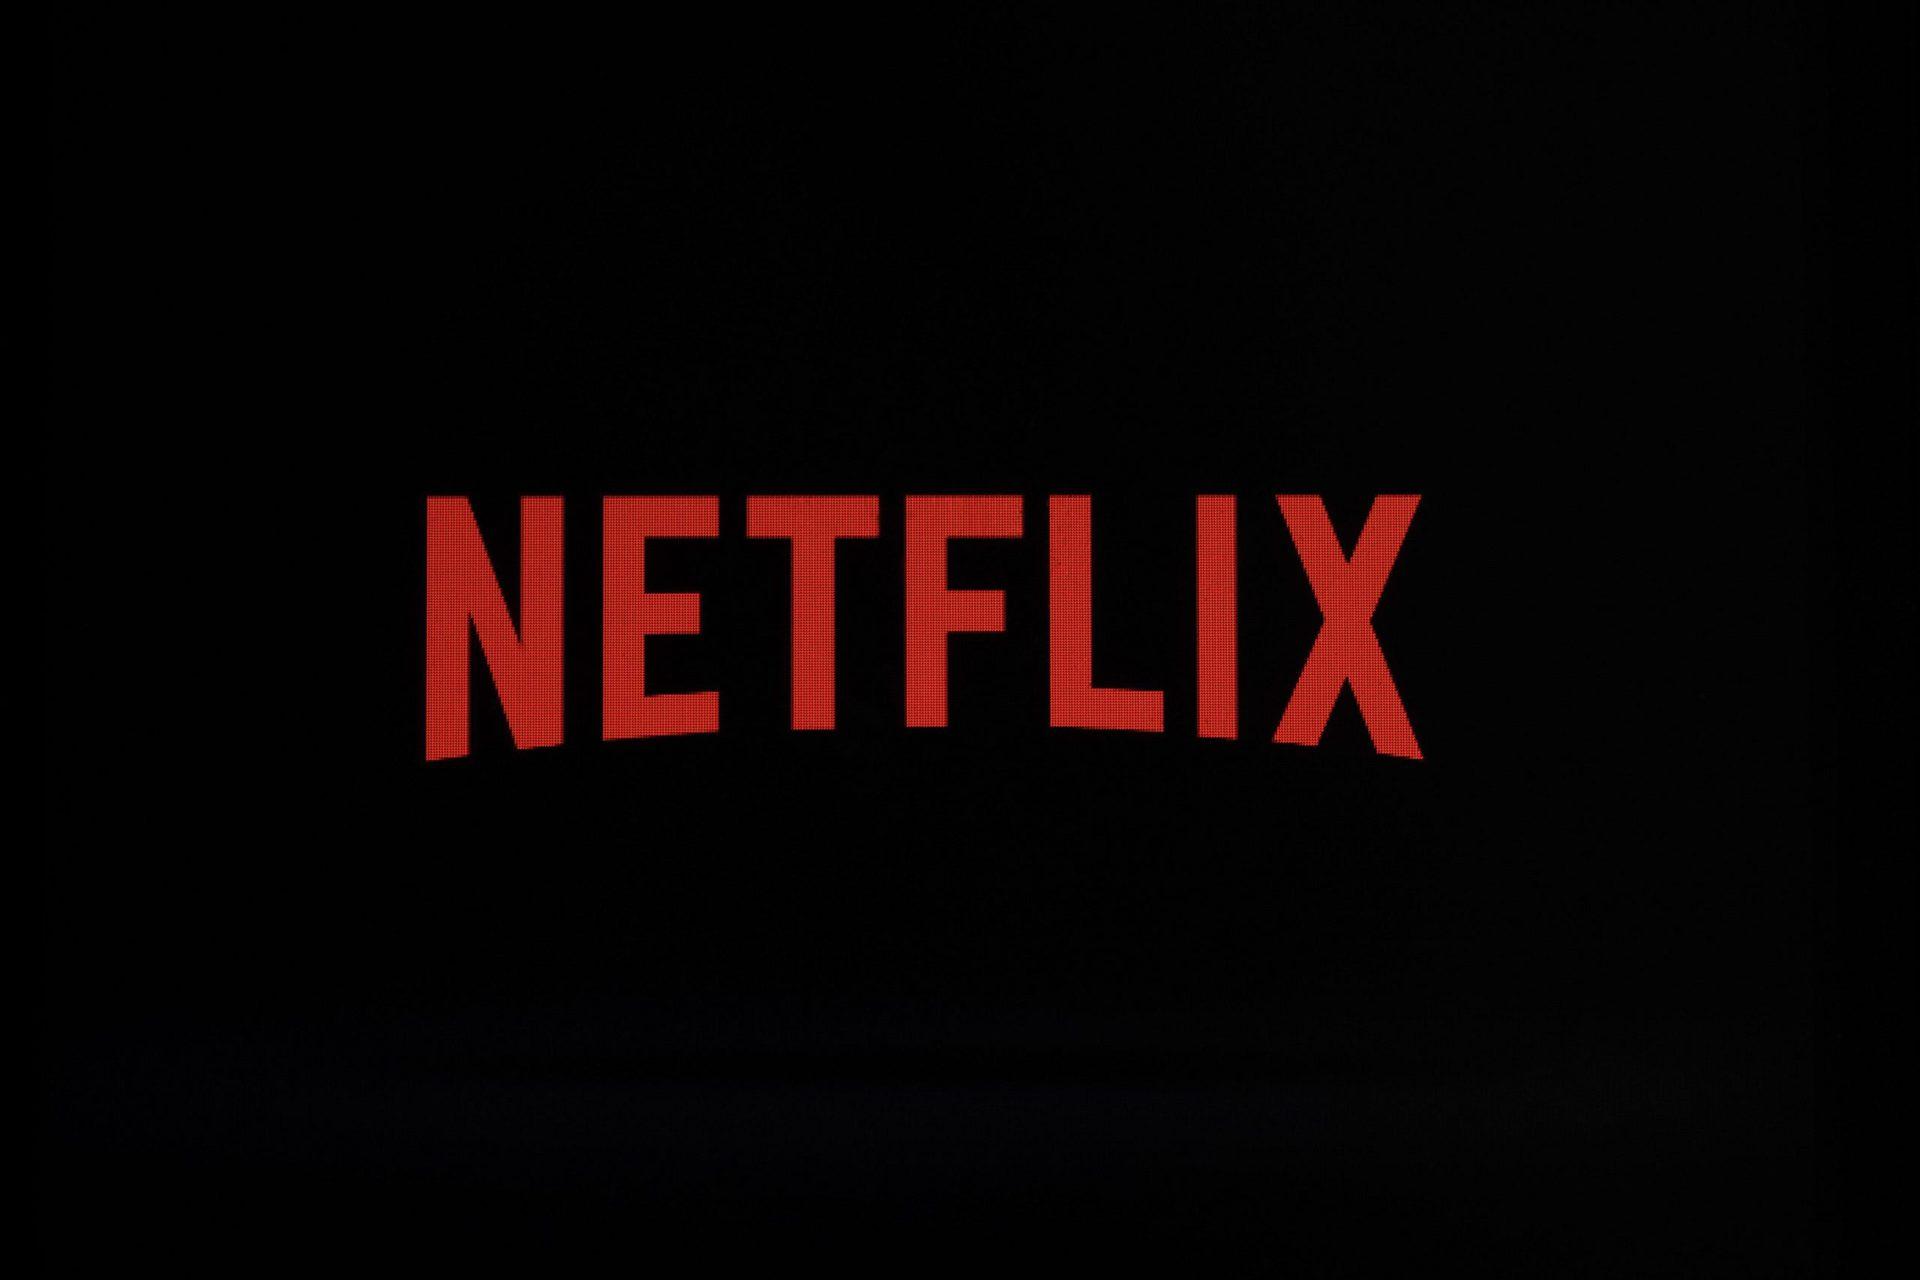 Preiserhöhung bei Netflix Streaming